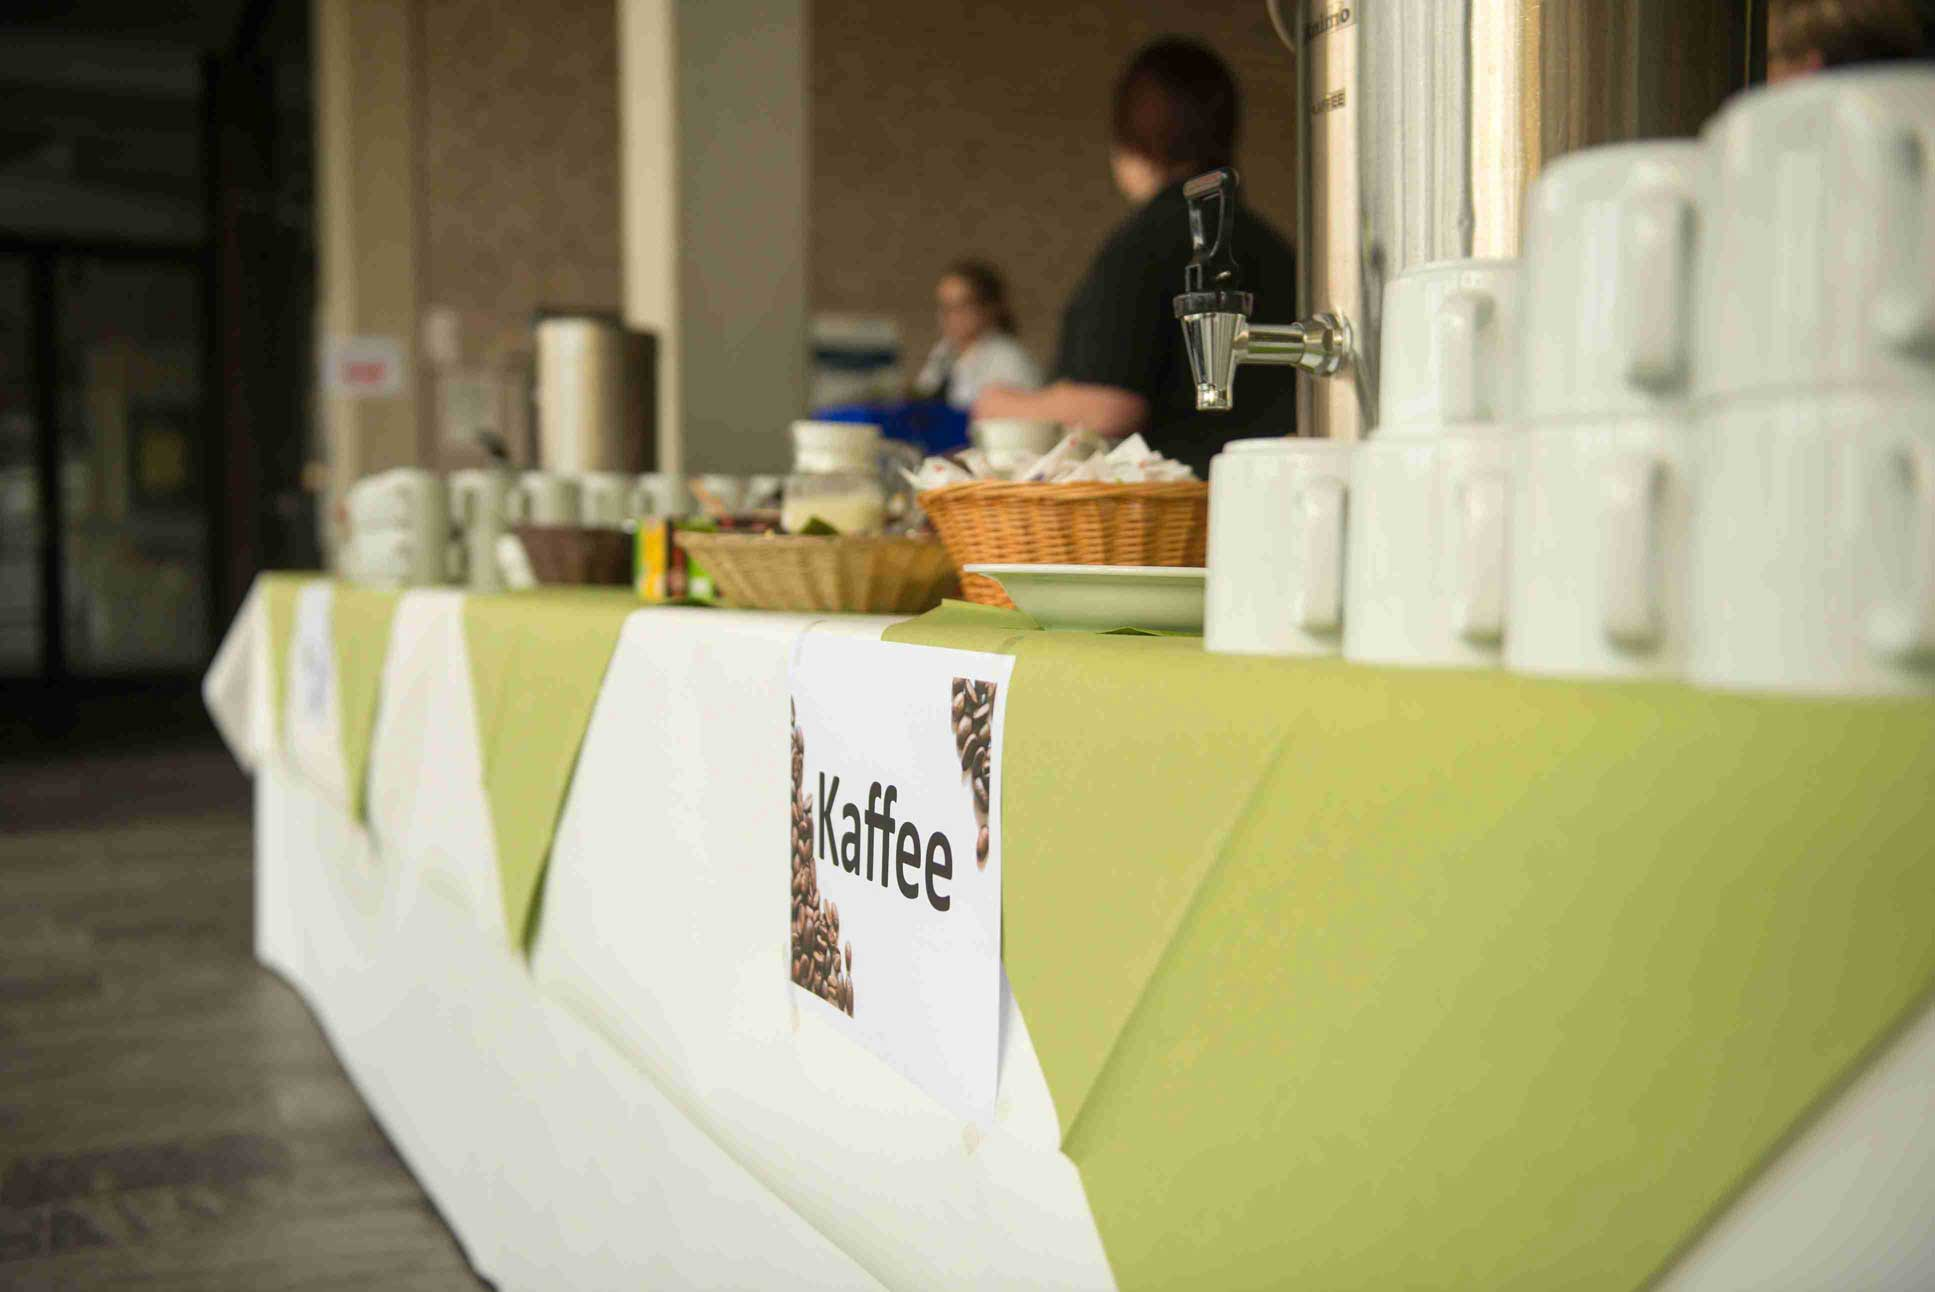 Fachtagung2014 Pause Kaffee